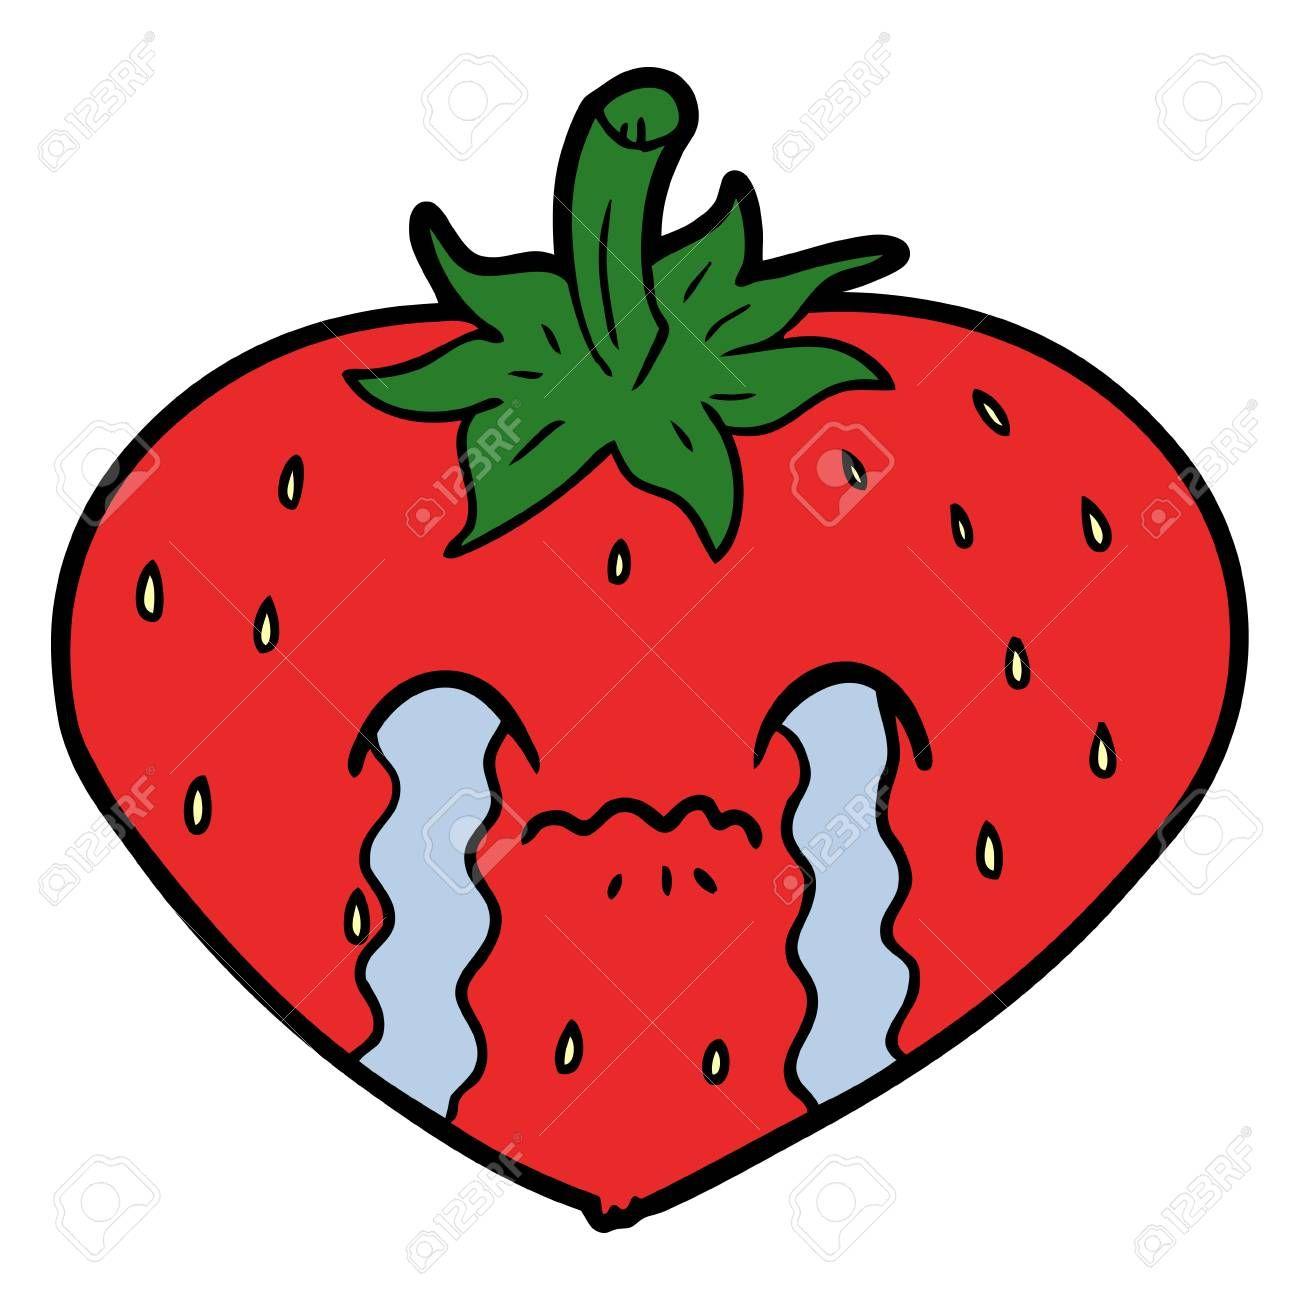 Crying Strawberry Cartoon Illustration Affiliate Strawberry Crying Illustration Cartoon Kids Rugs Cartoon Illustration Cartoon